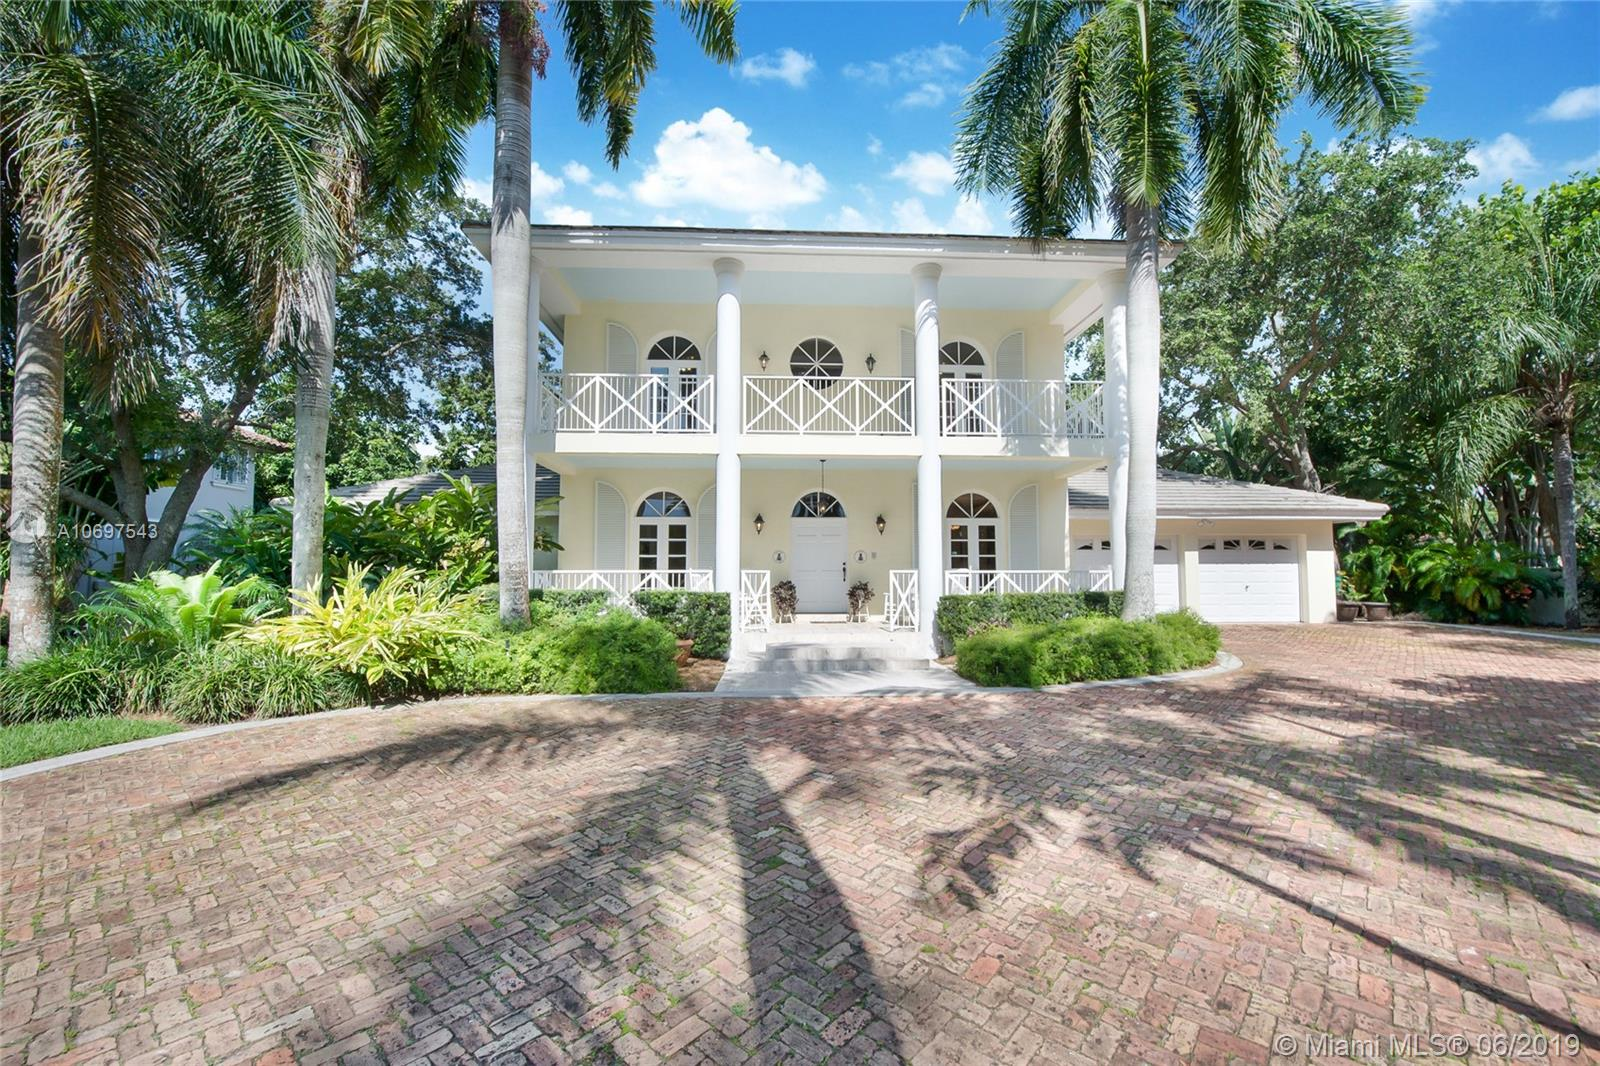 5730 SW 100 St, Coral Gables, Florida